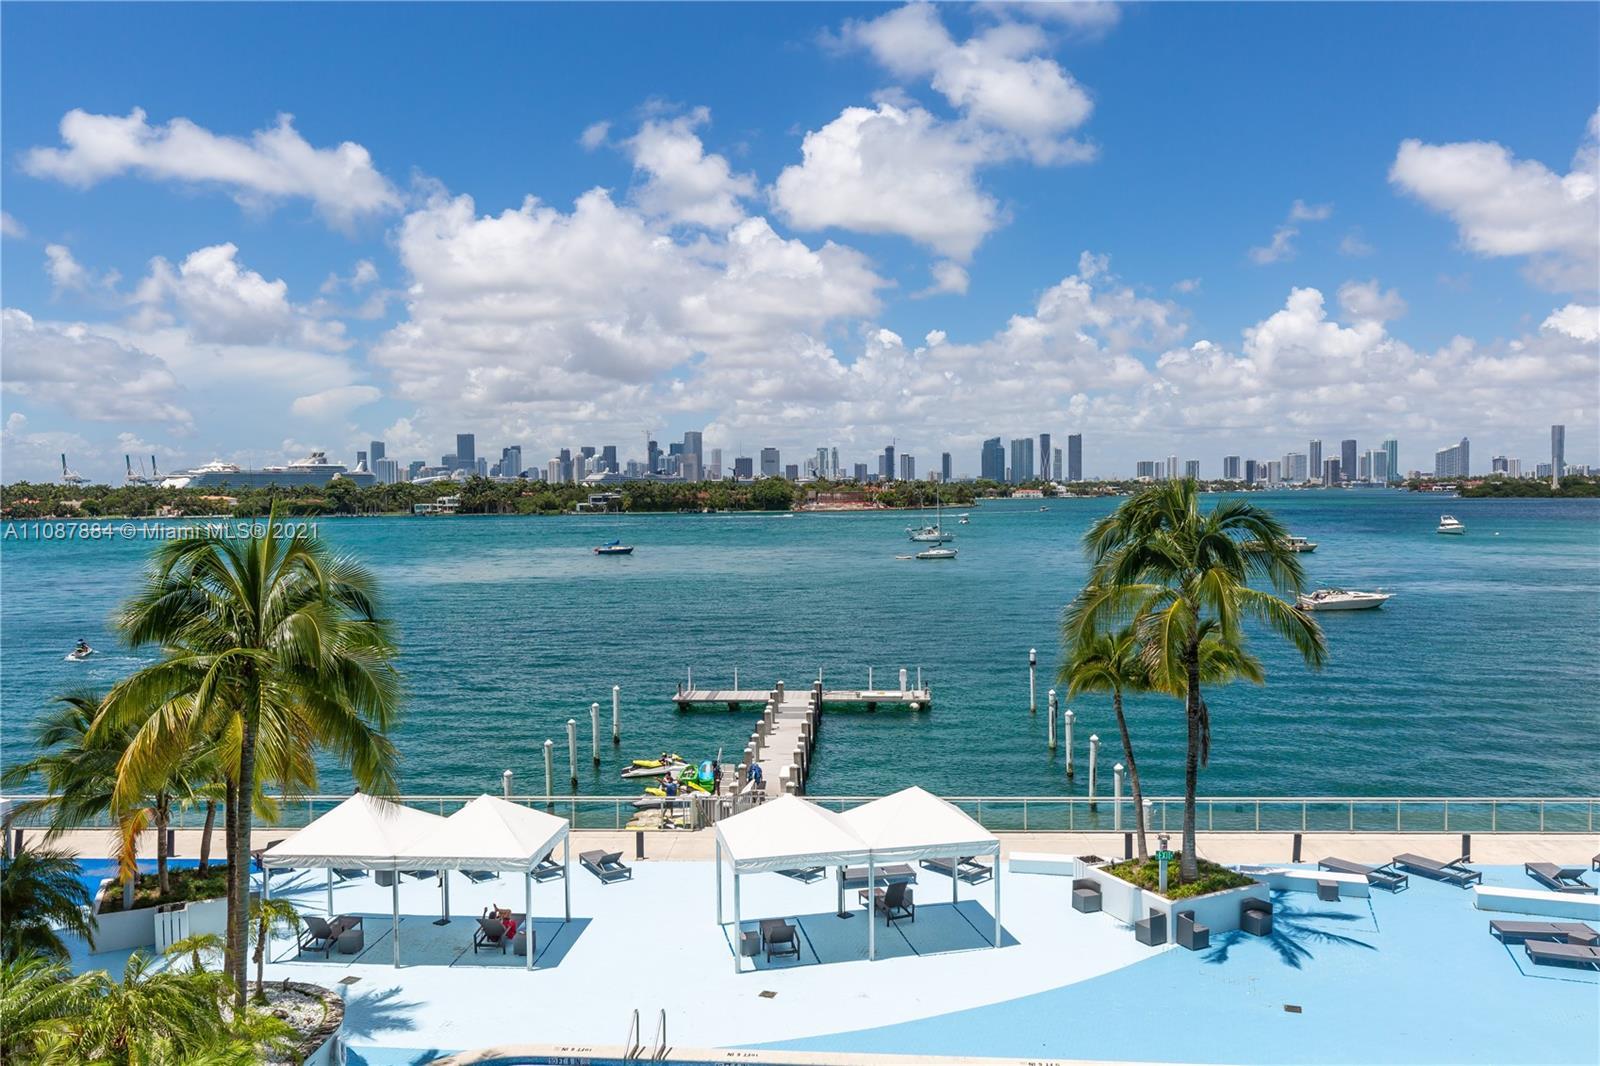 Mirador South #417 - 1000 West Ave #417, Miami Beach, FL 33139